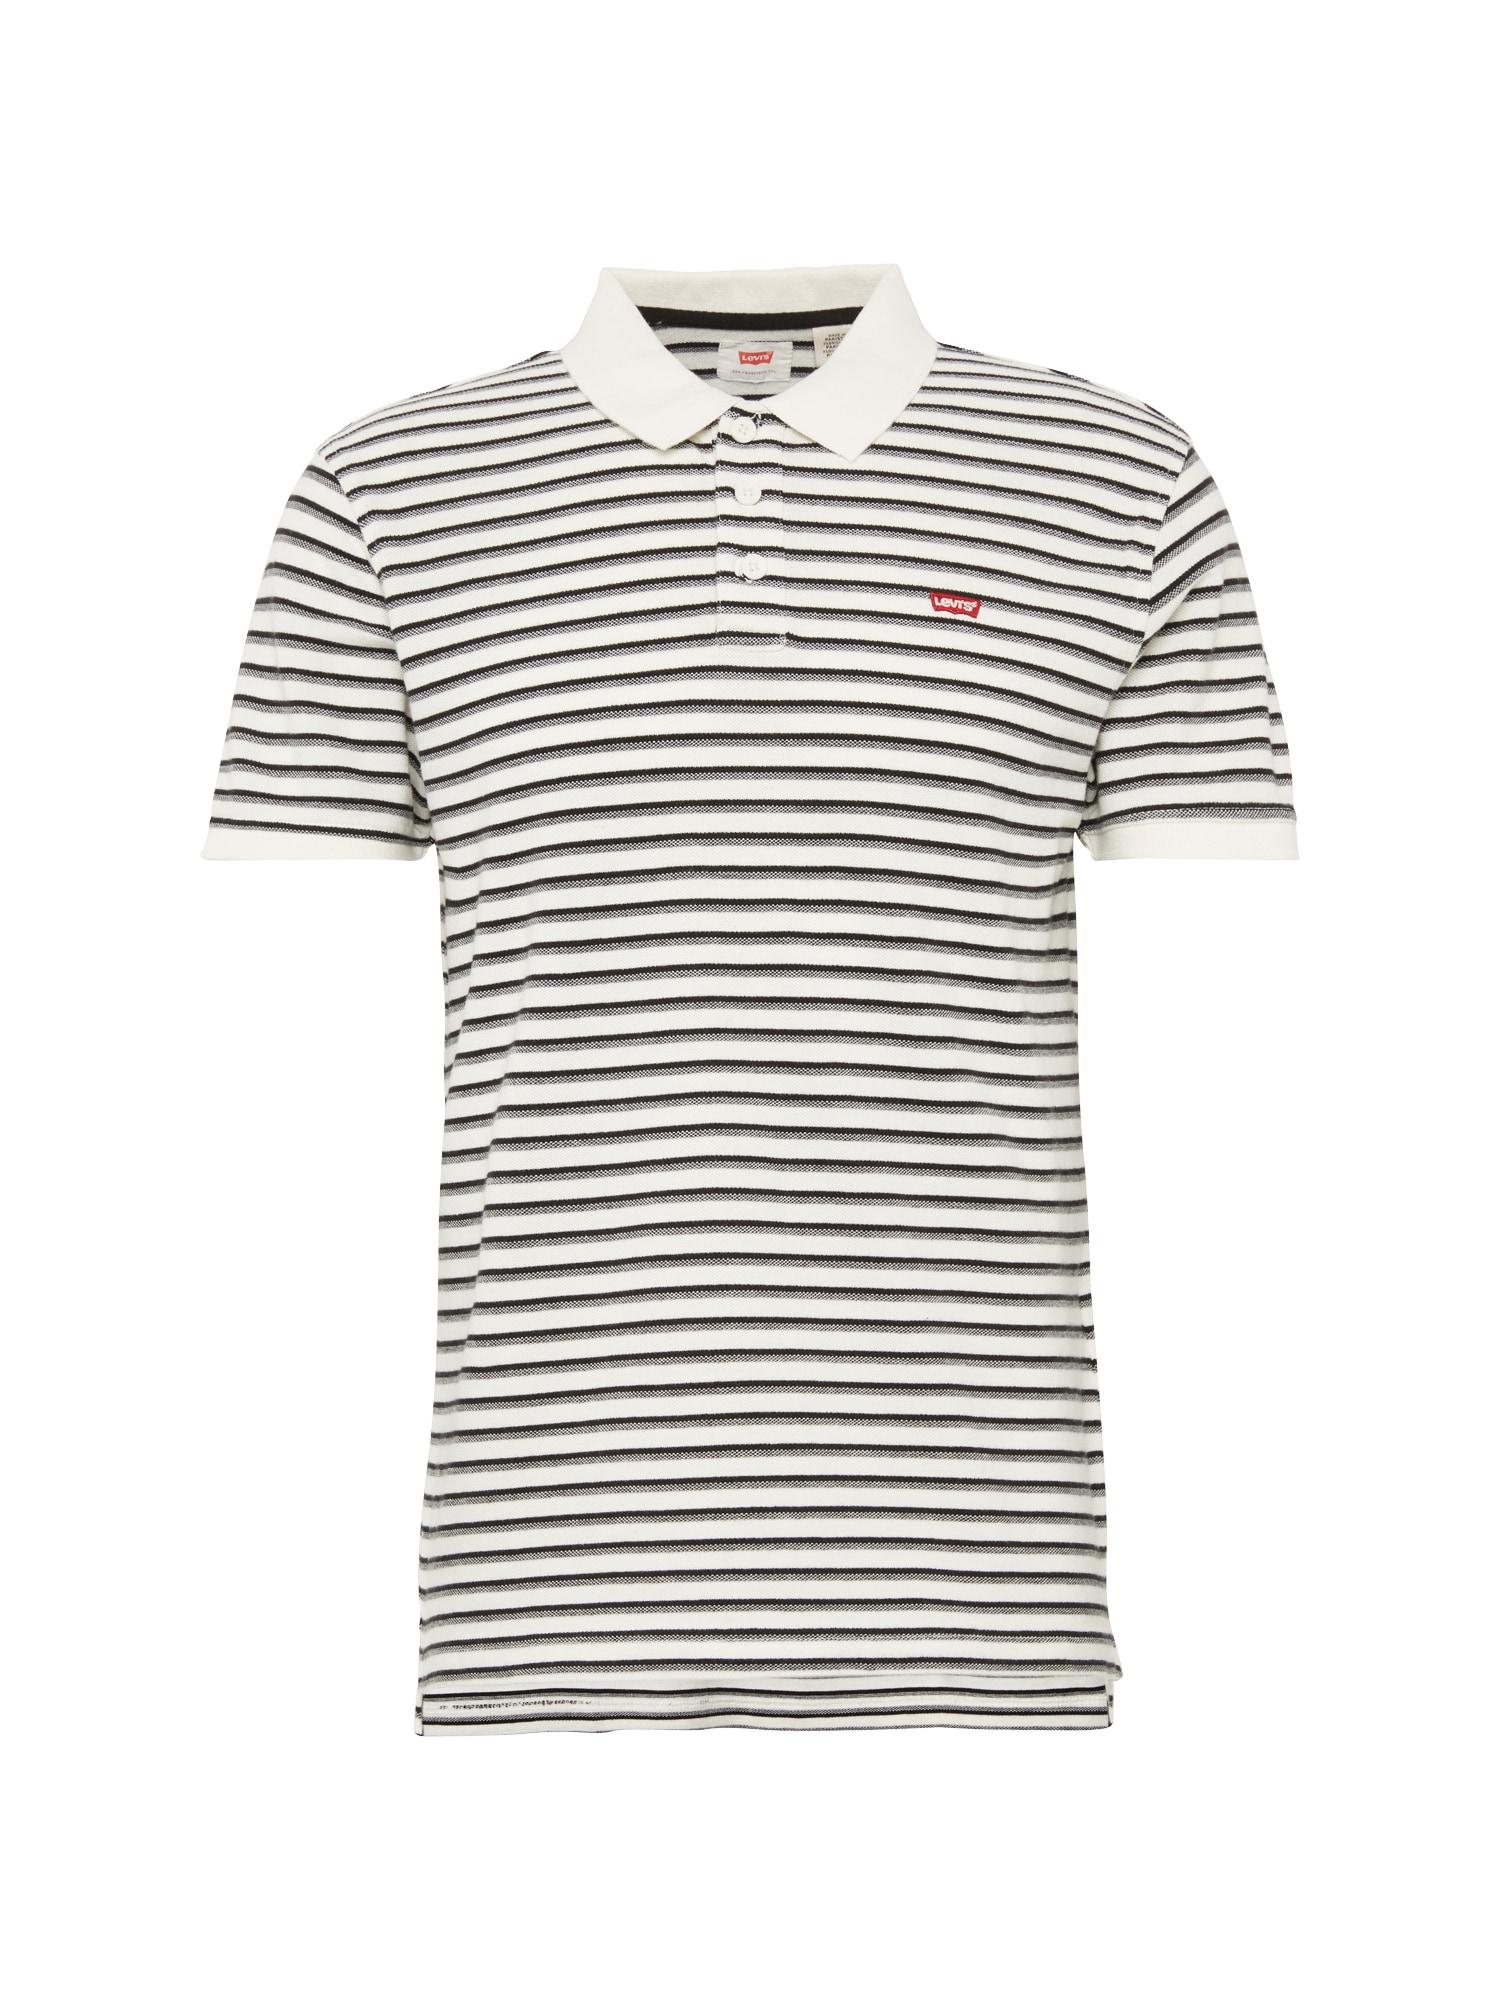 LEVI'S Heren Shirt STANDARD HM GOOD POLO crème zwart